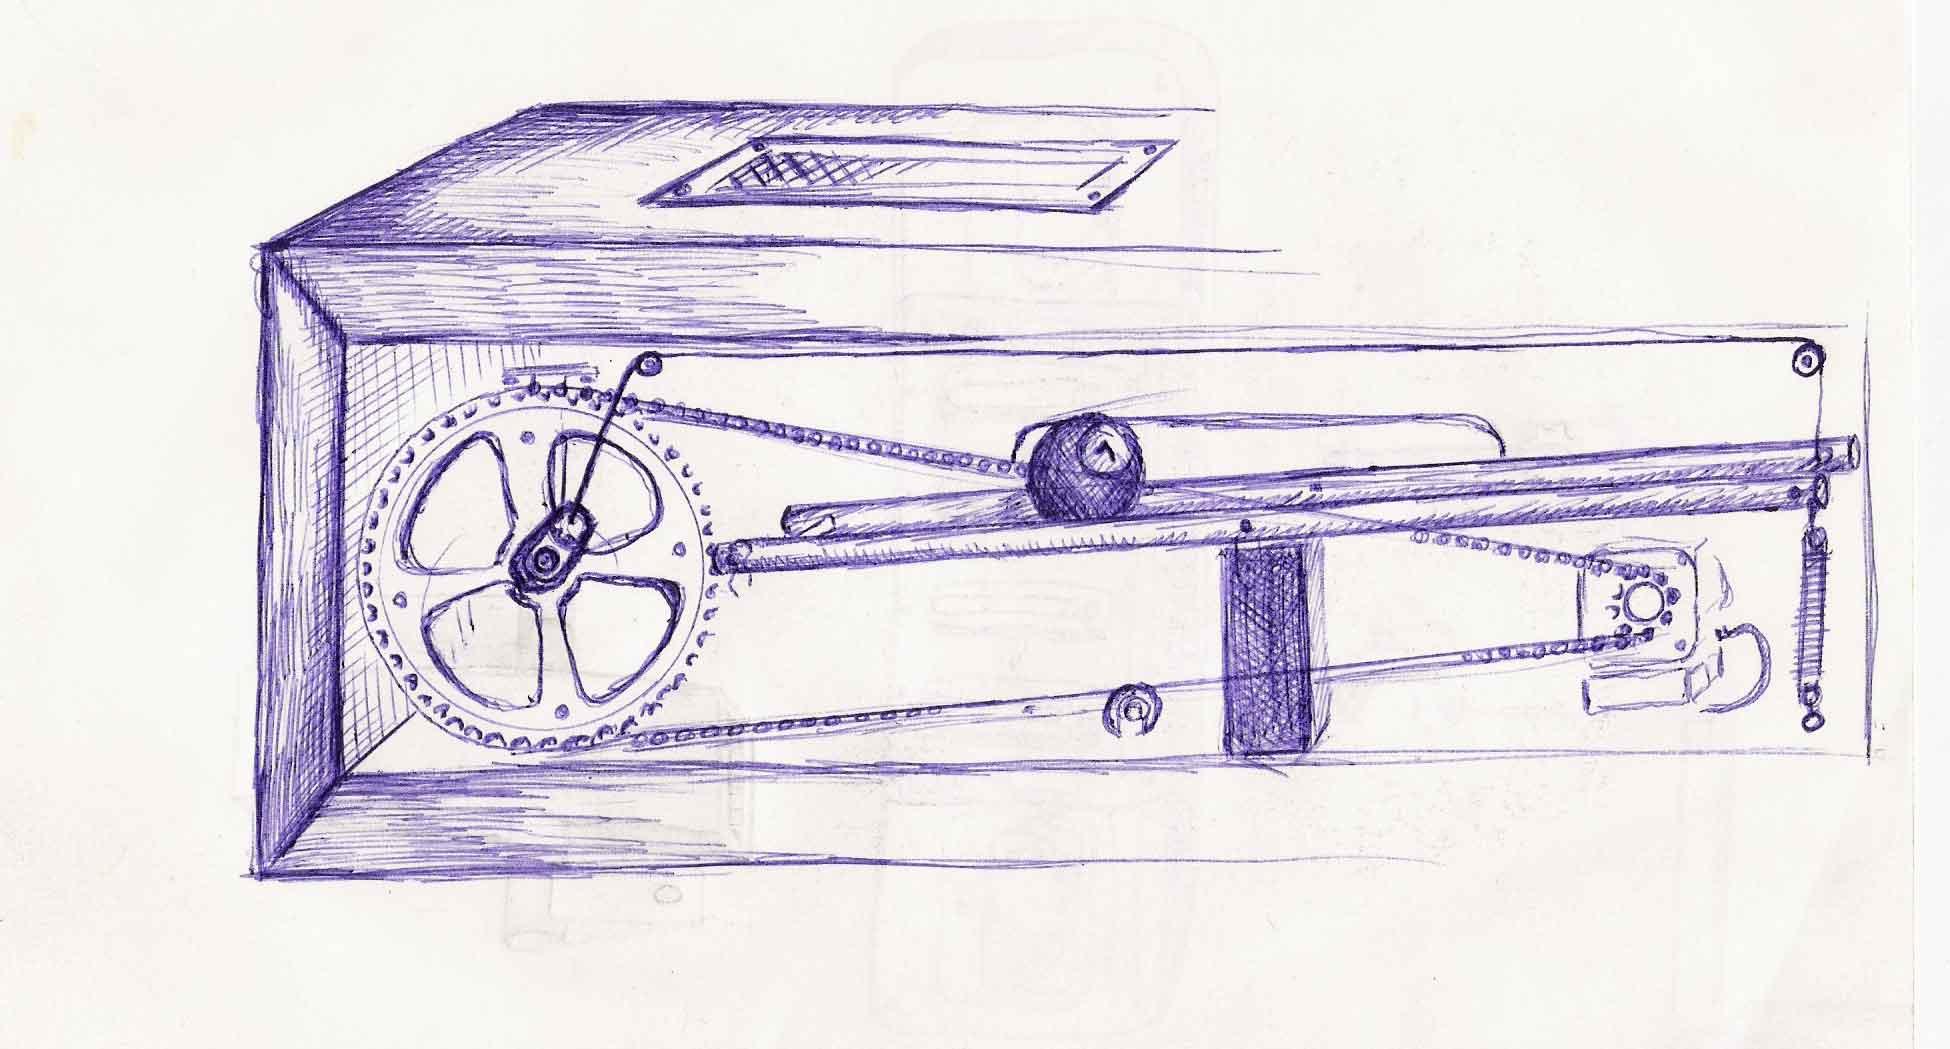 sketch-57-sept-05.jpg